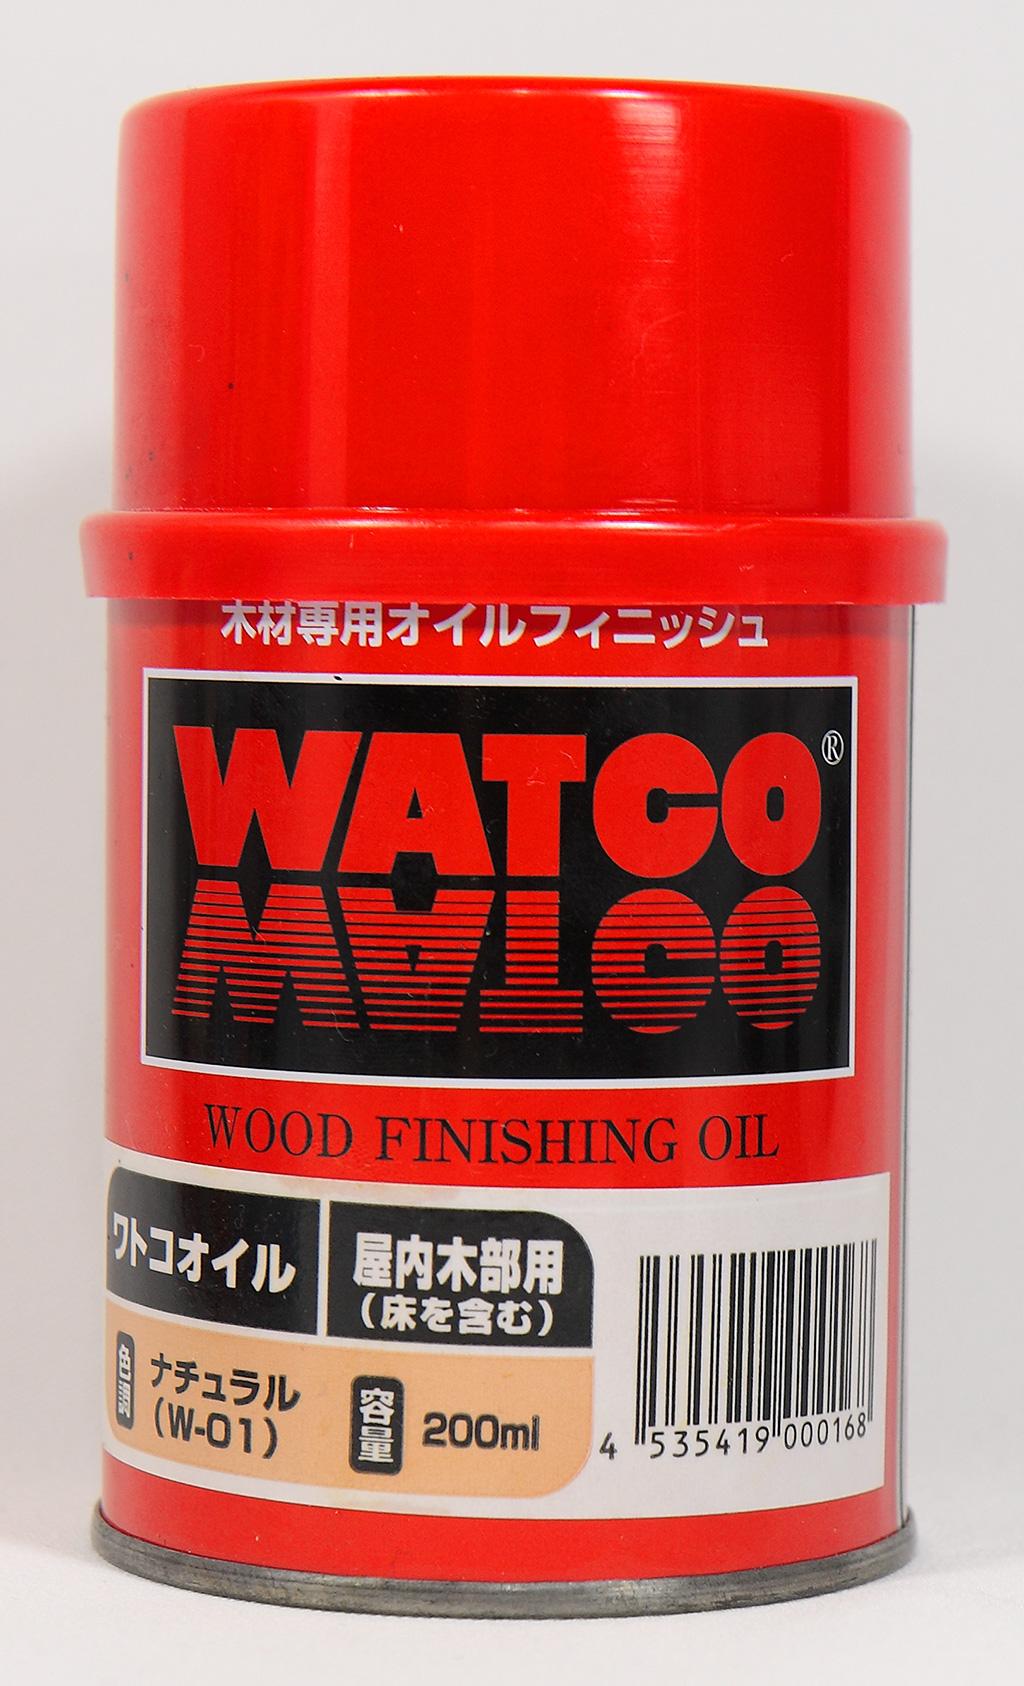 Watco W-01 Natural